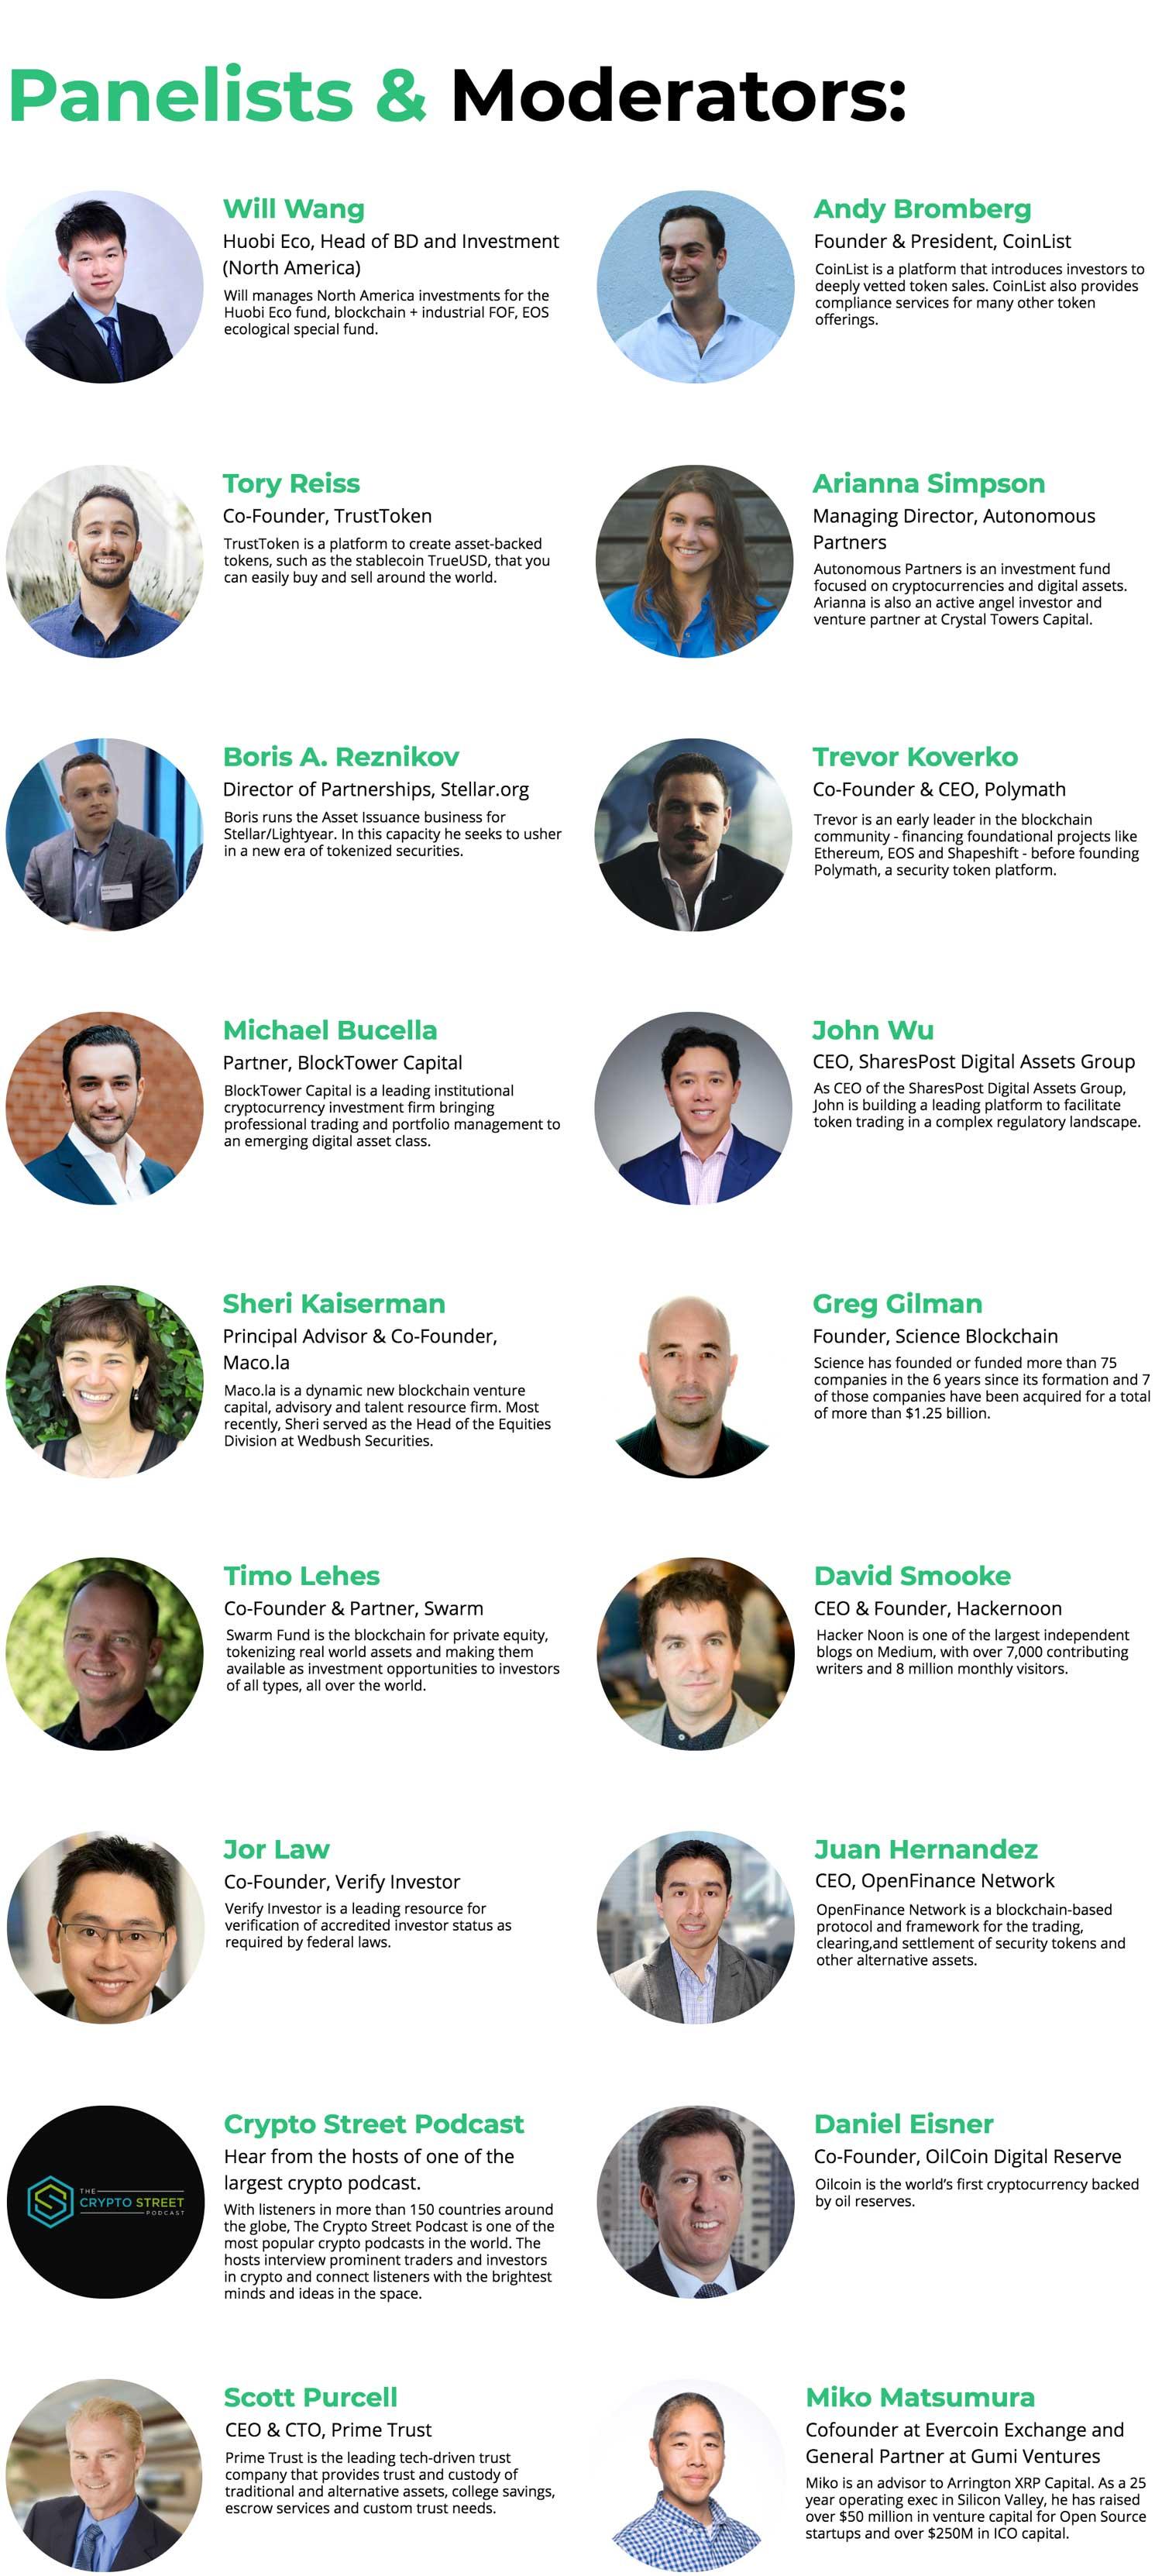 Panelists & Moderators